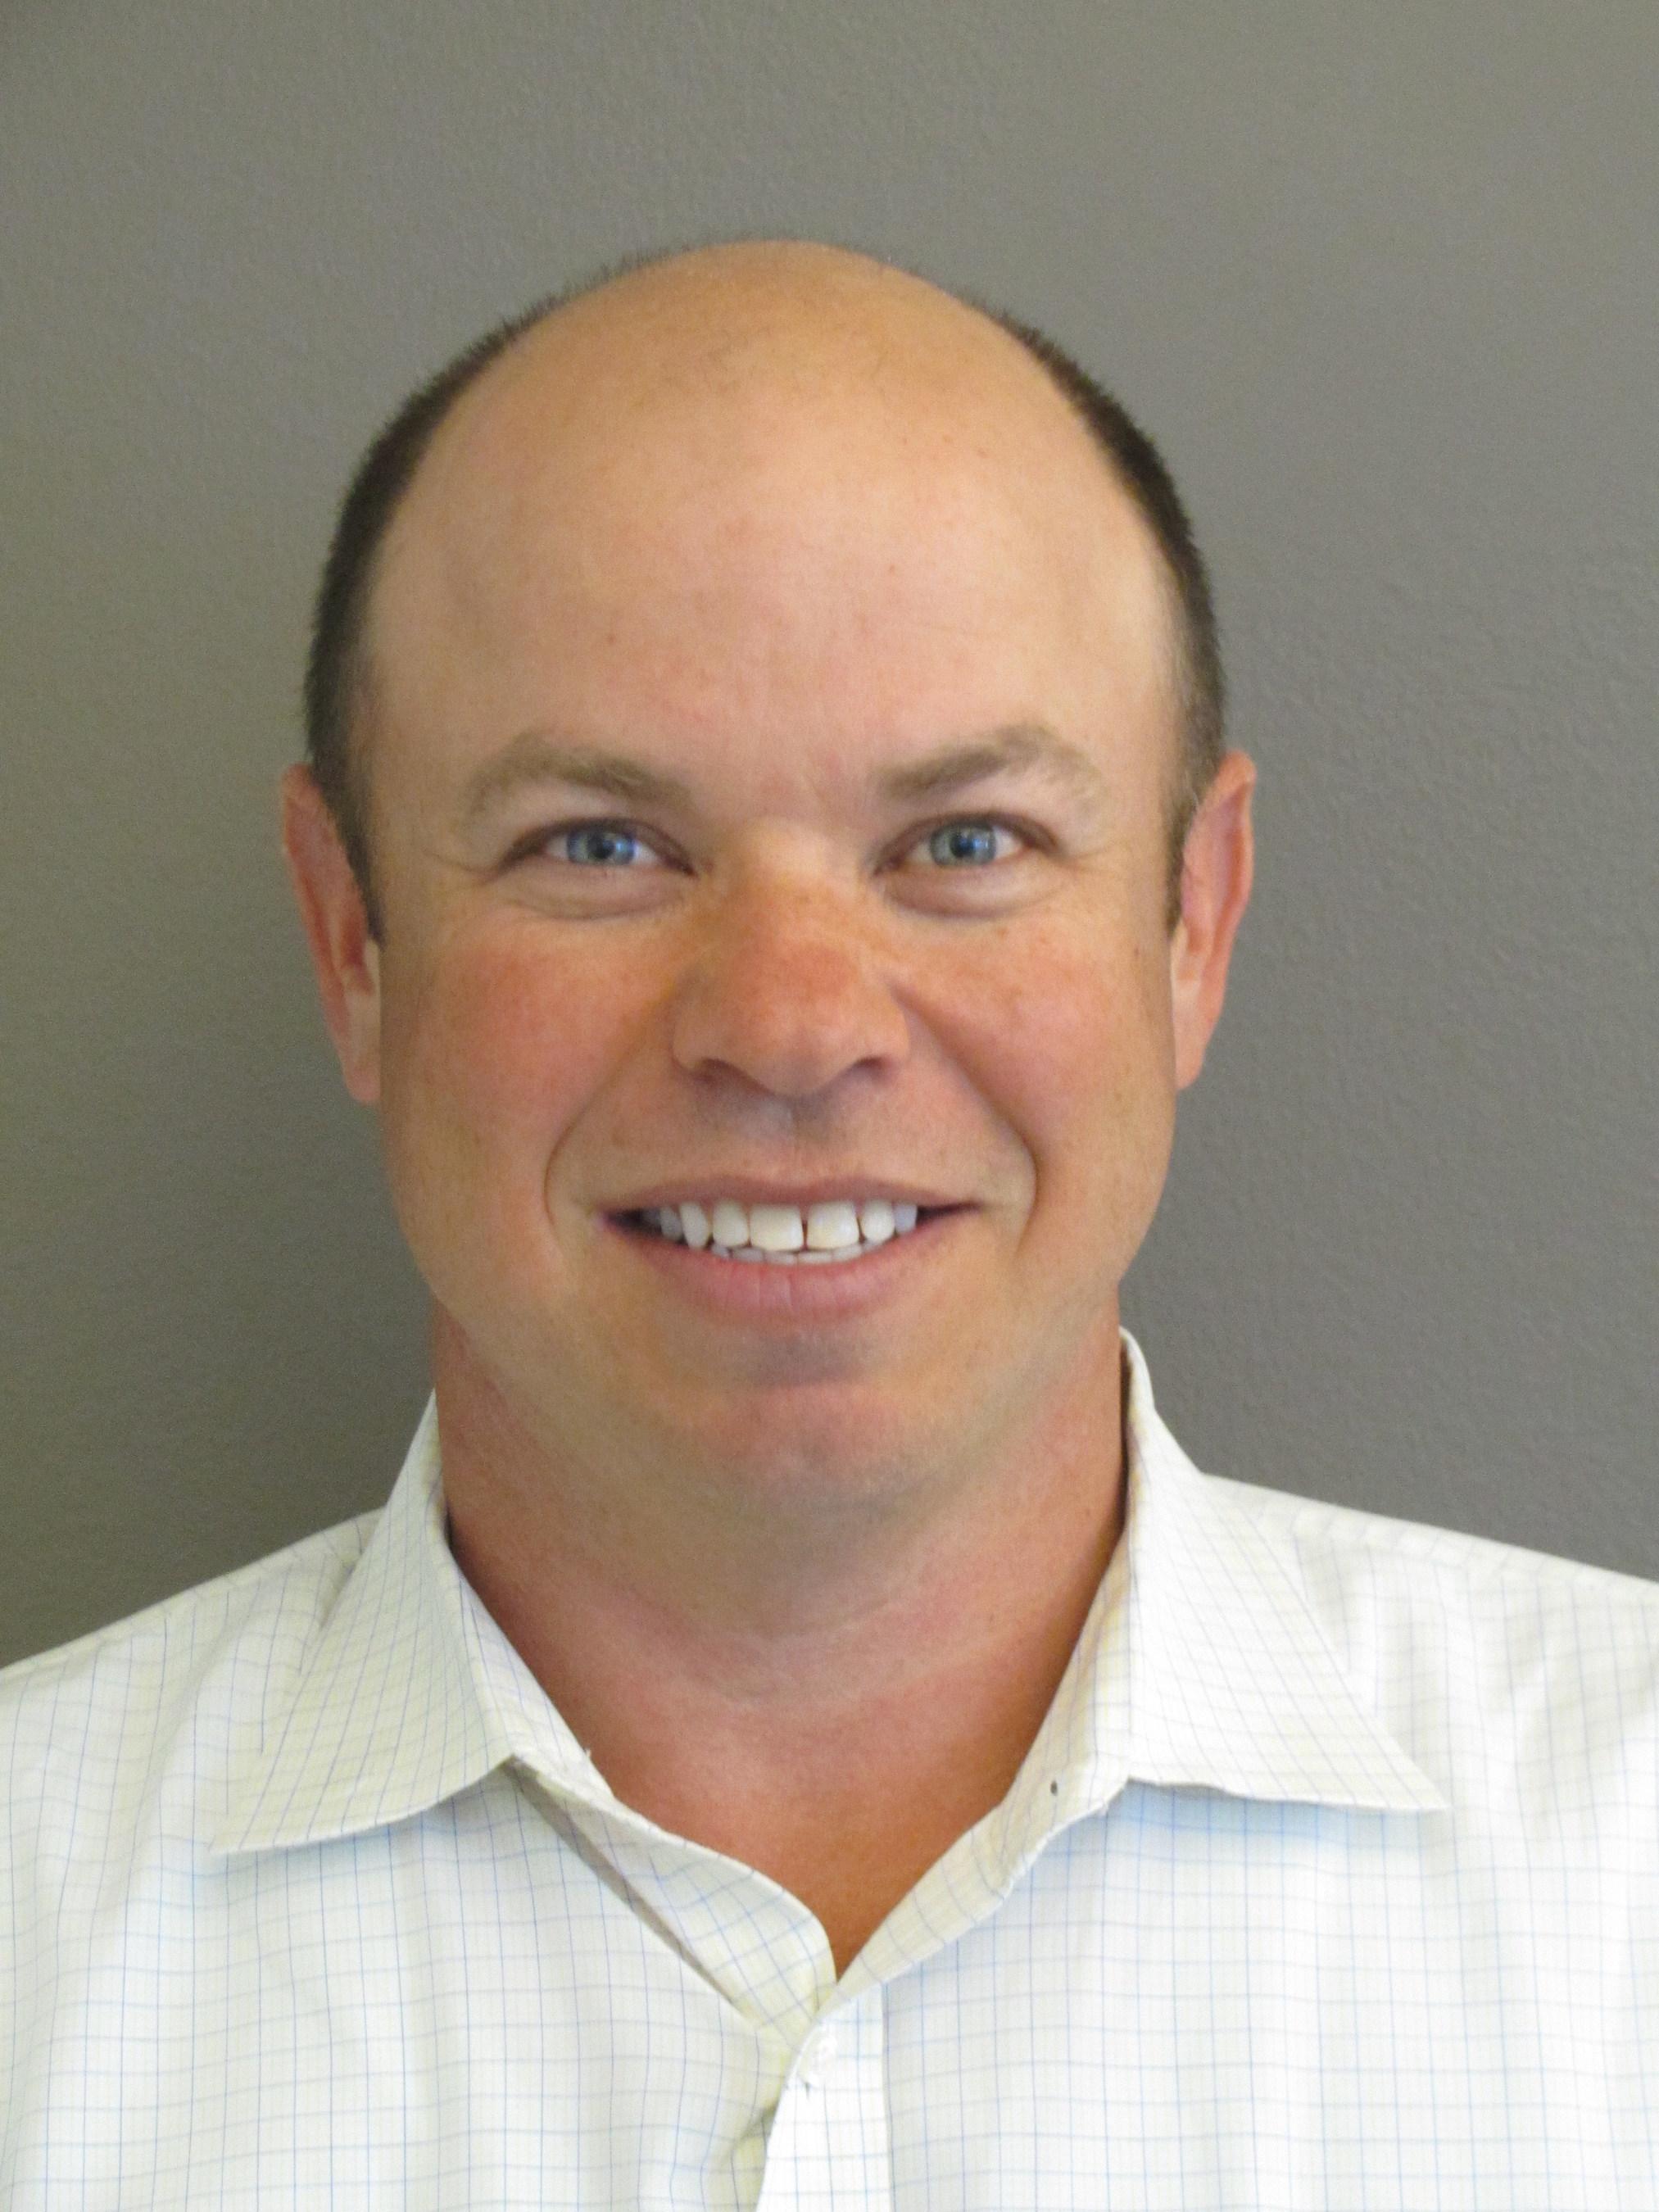 Nexmo Appoints PayPal/eBay Veteran Eddie Davis as Vice President of Sales to Address Increasing Global Demand